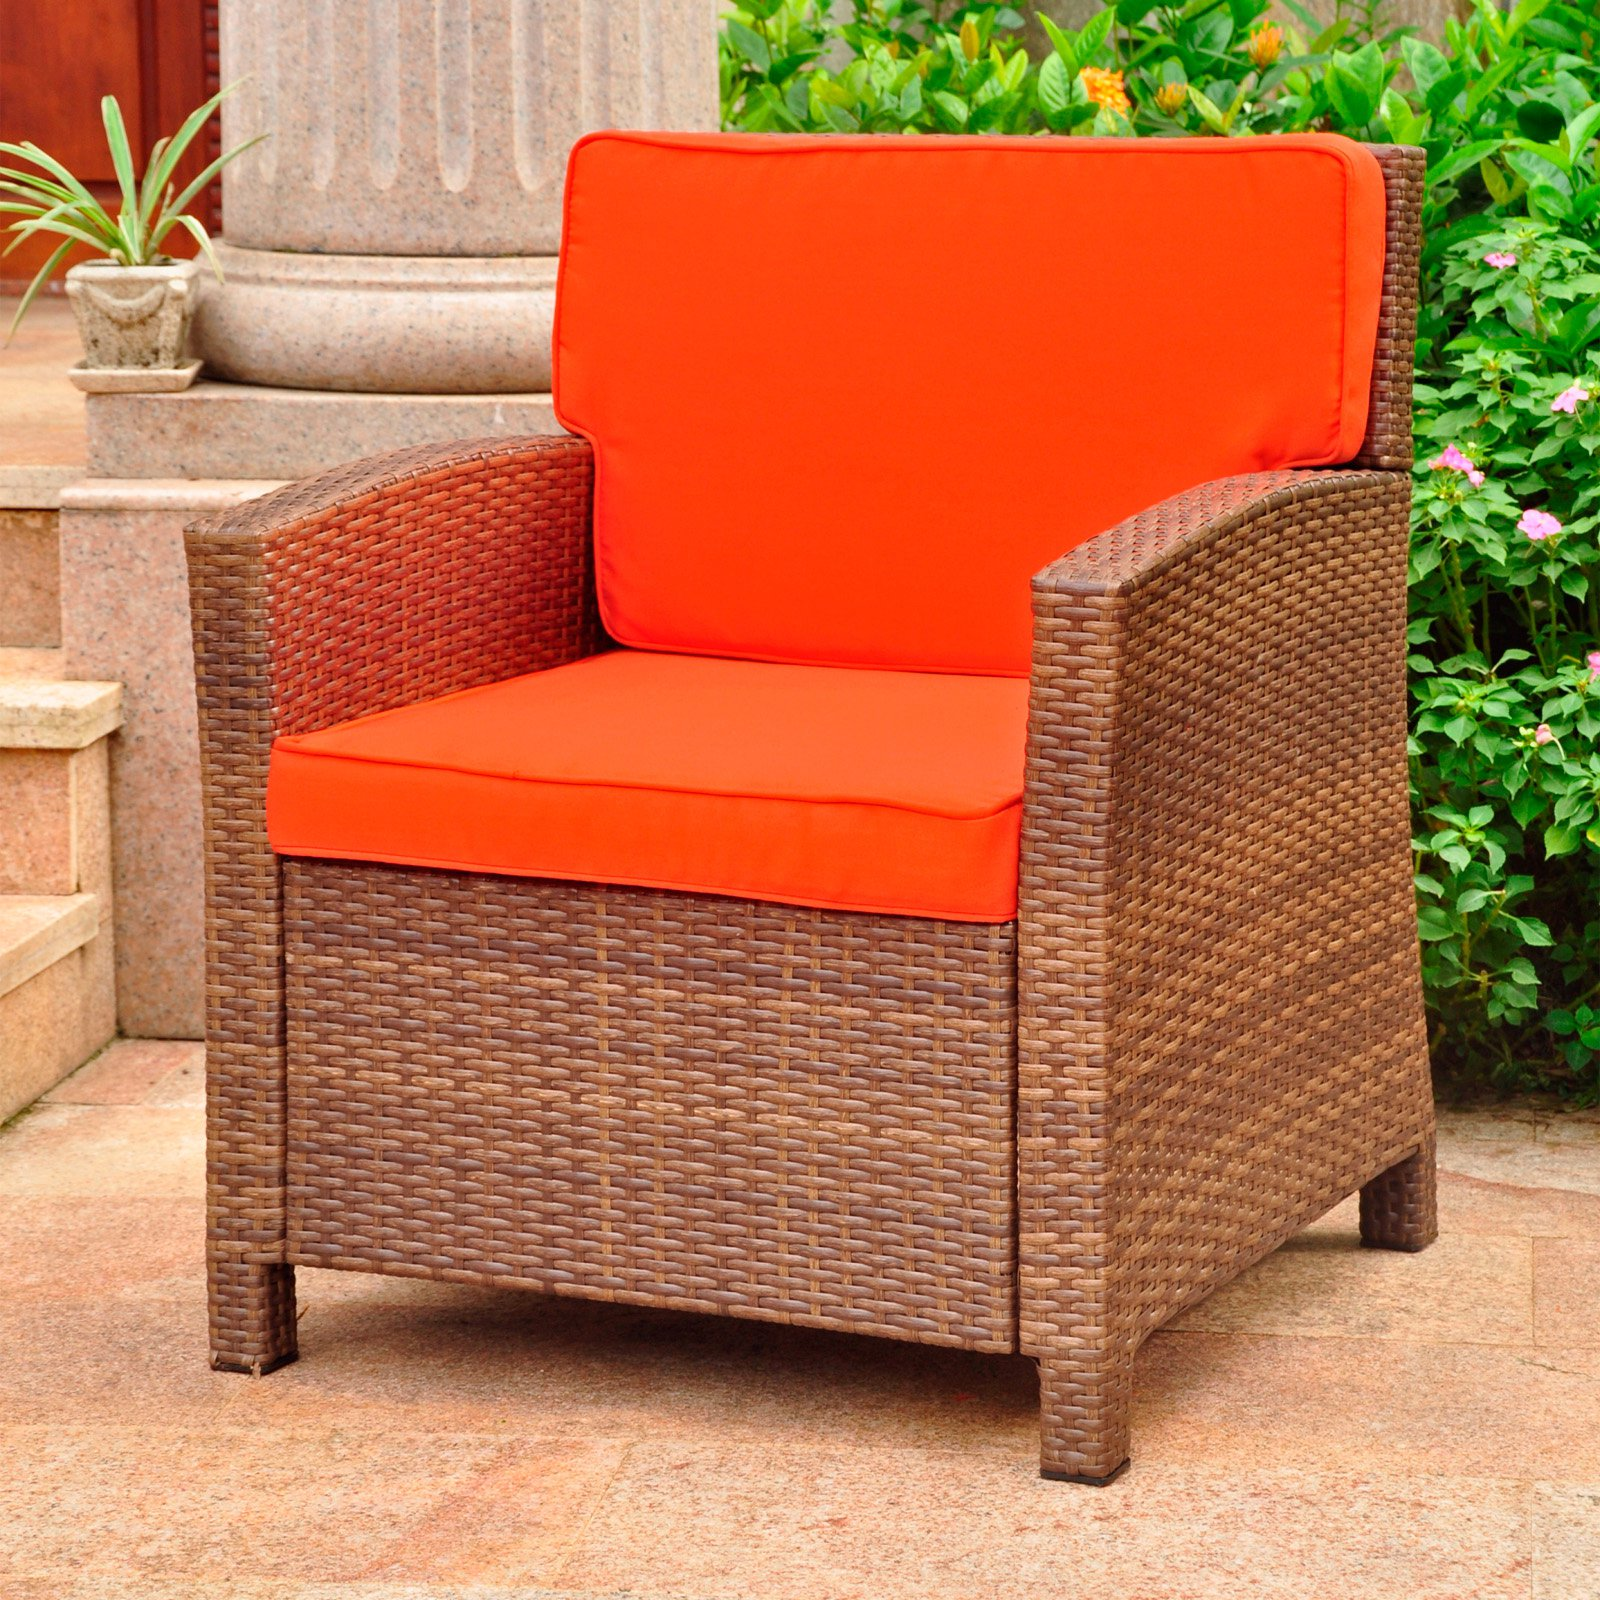 International Caravan Valencia Resin Wicker/ Steel Contemporary Deep Seat Armchair with Cushions